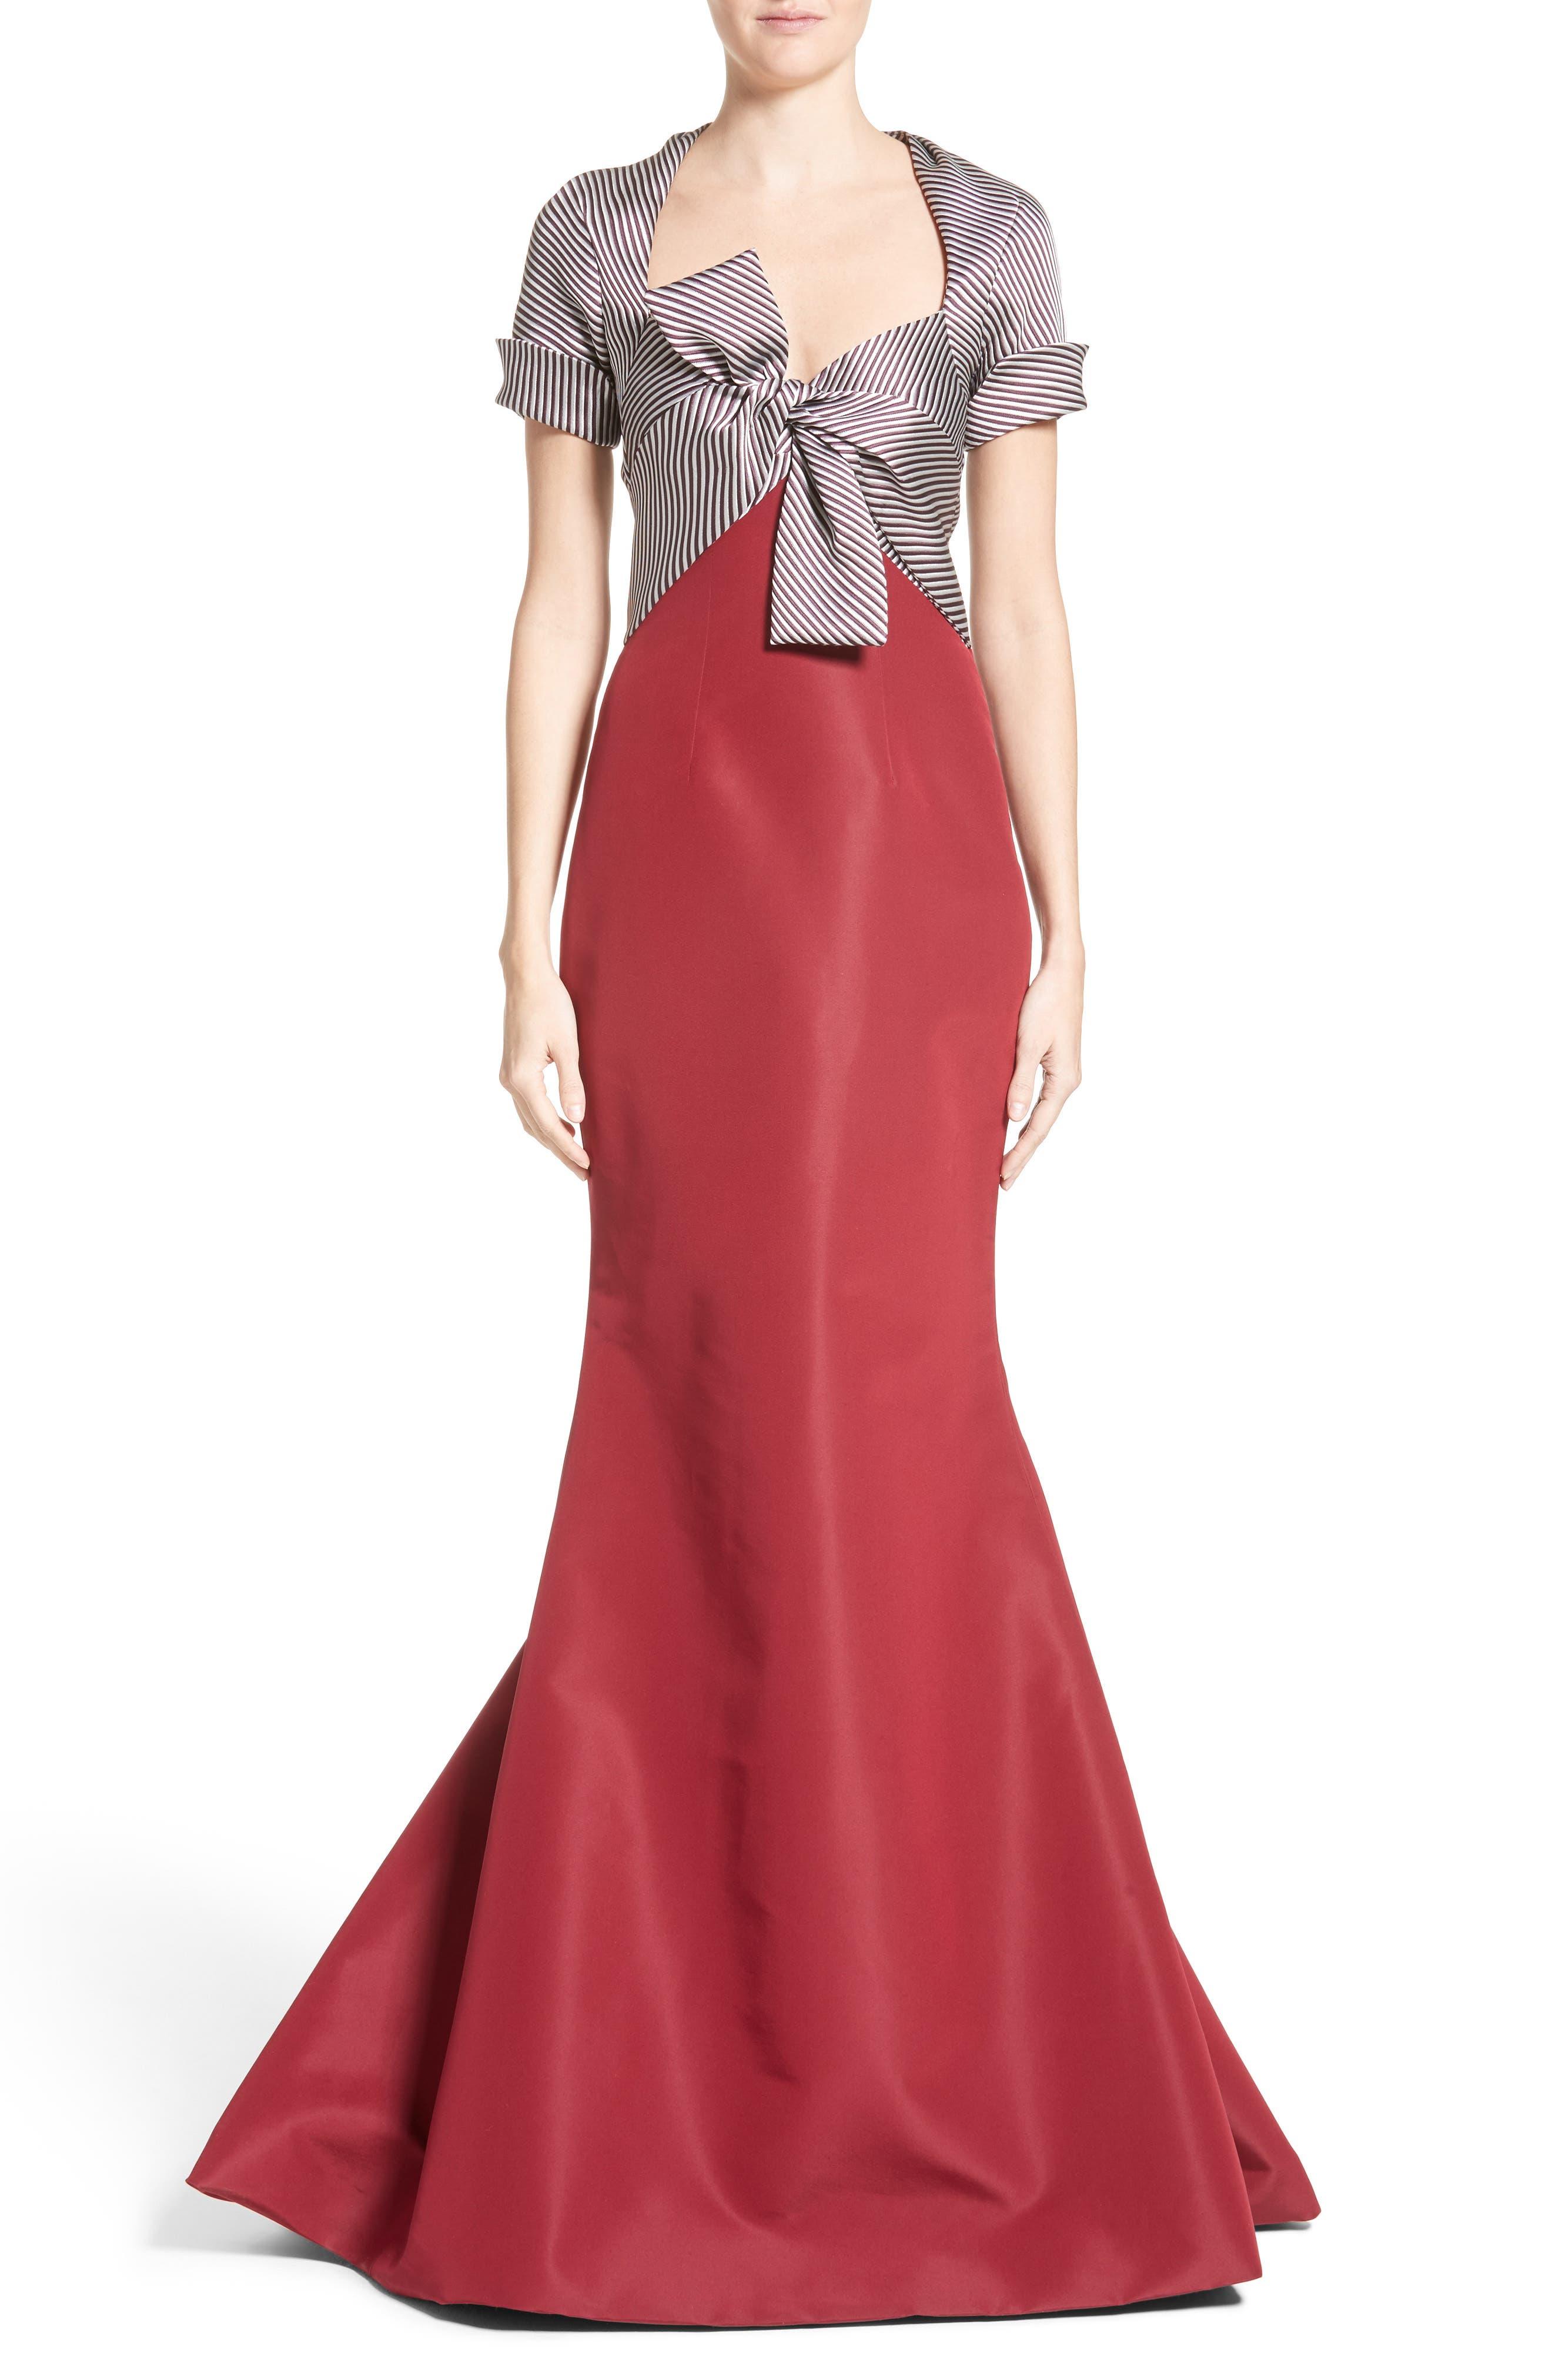 Main Image - Carolina Herrera Bow Front Colorblock Gown